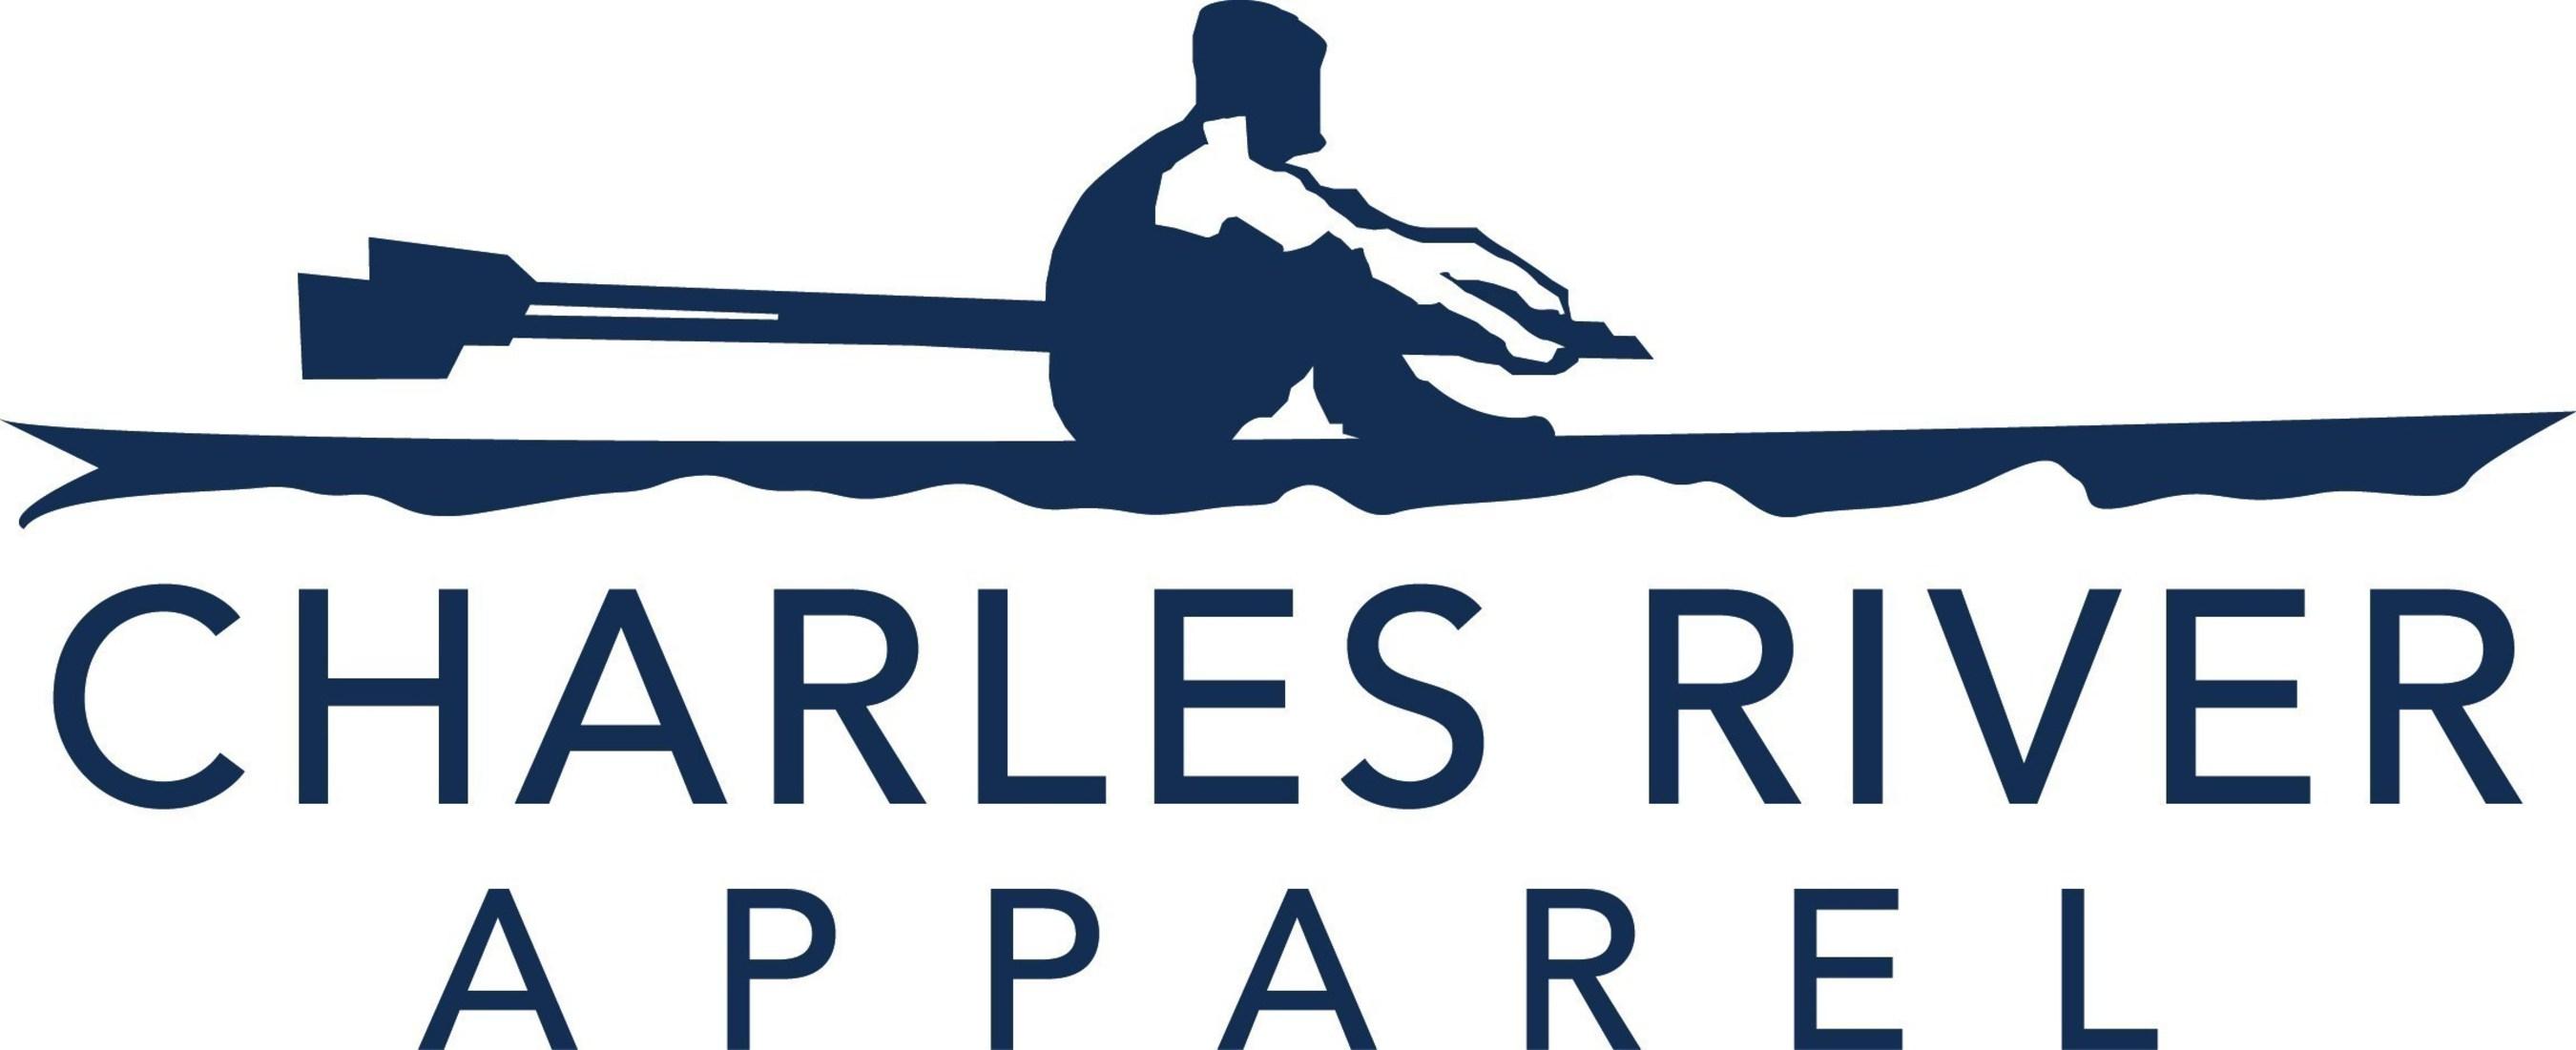 Image result for charles river apparel logo